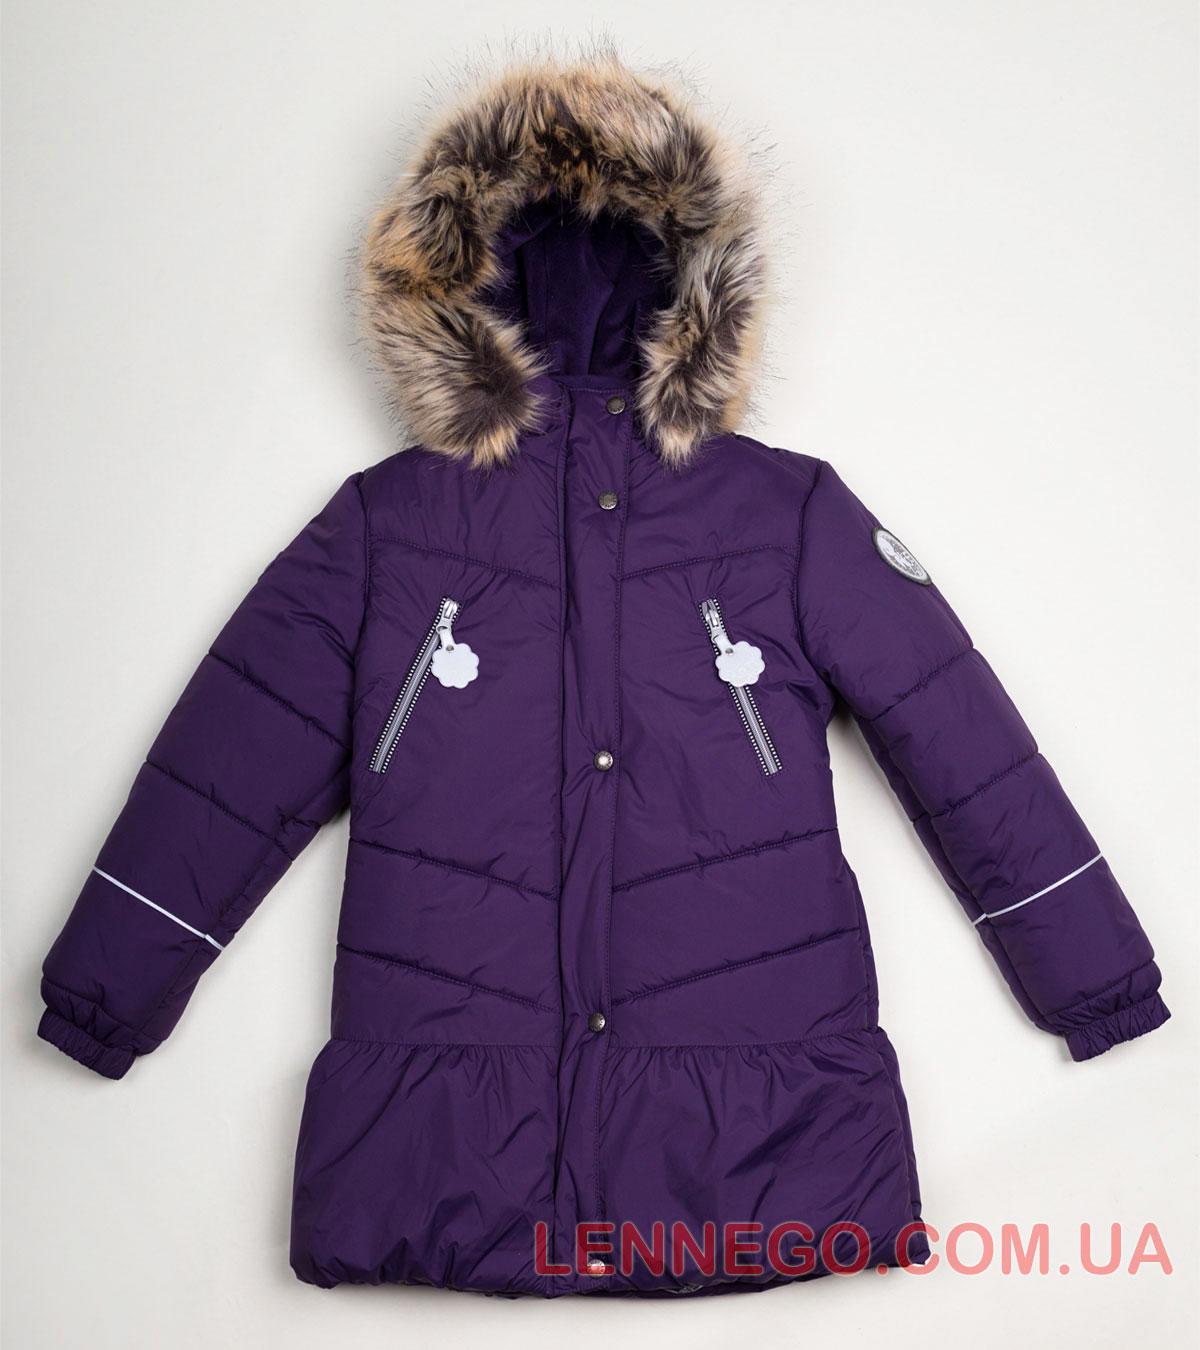 Lenne Miia пальто для девочки баклажан